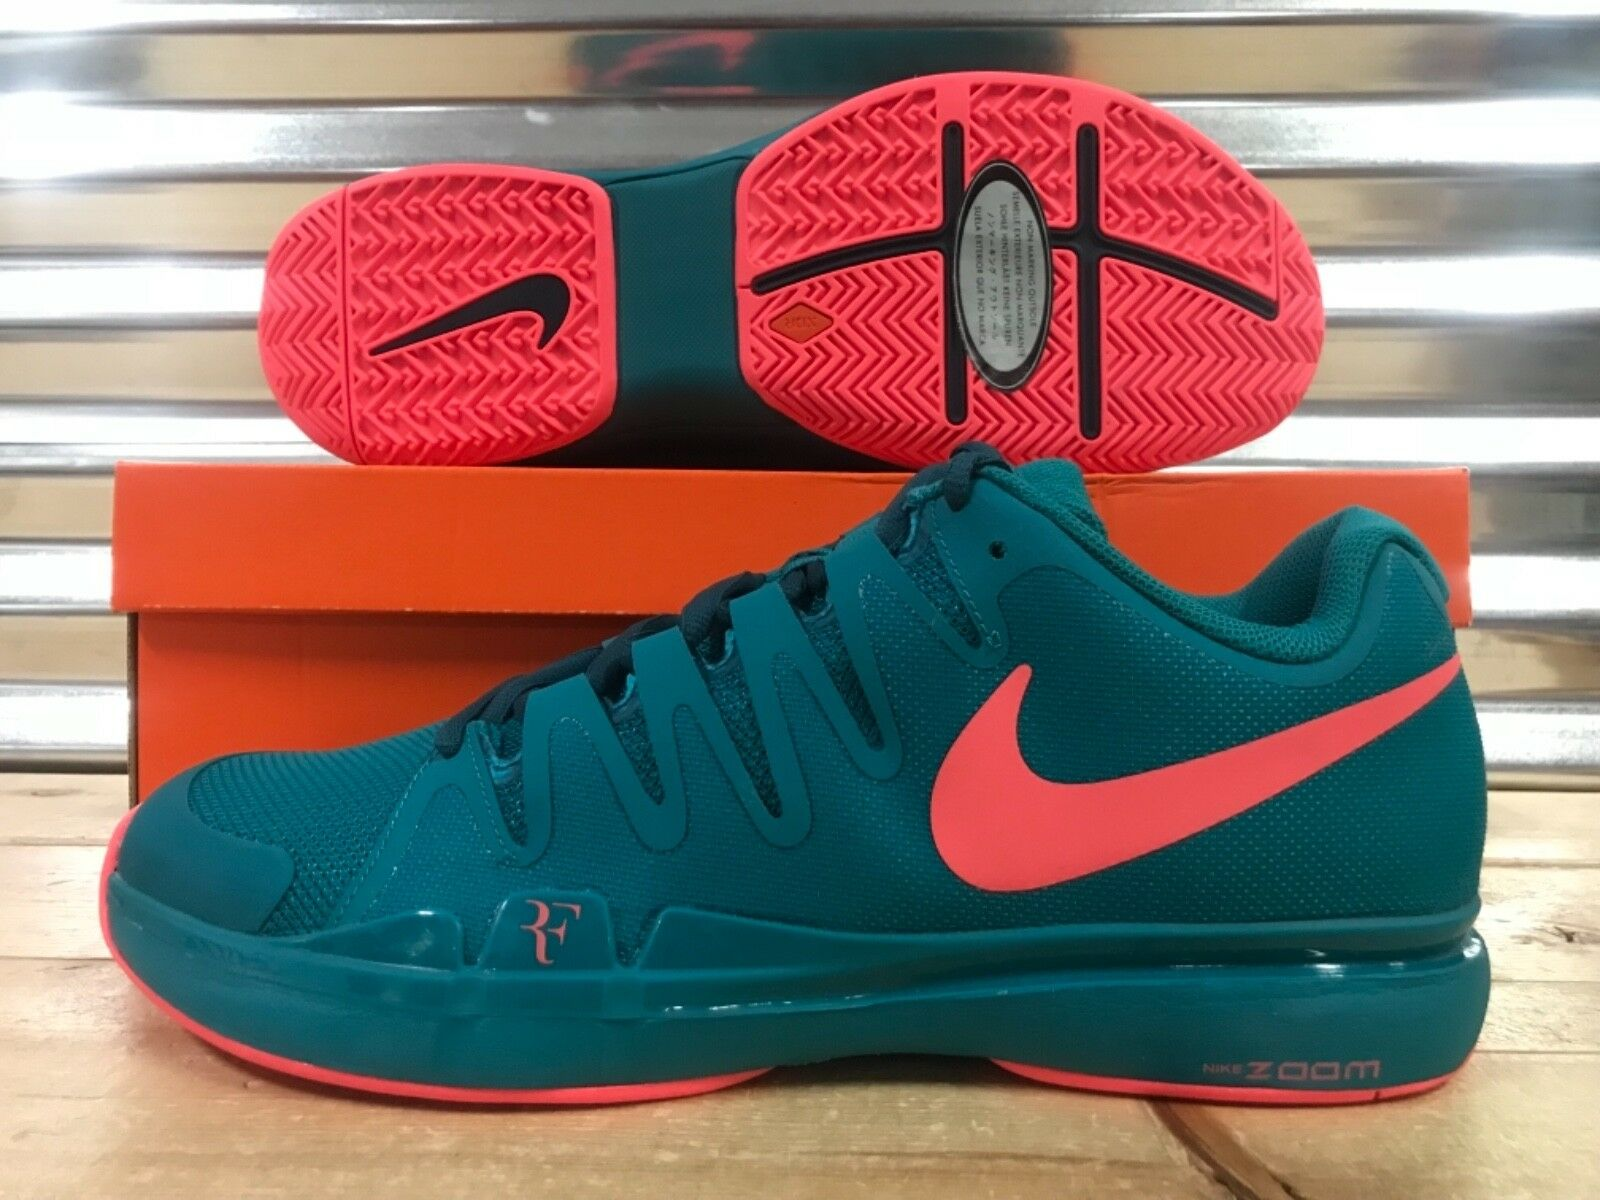 Nike Zoom Vapor 9.5 Tour LG Federer Tennis shoes Emerald Lava SZ ( 813025-300 )